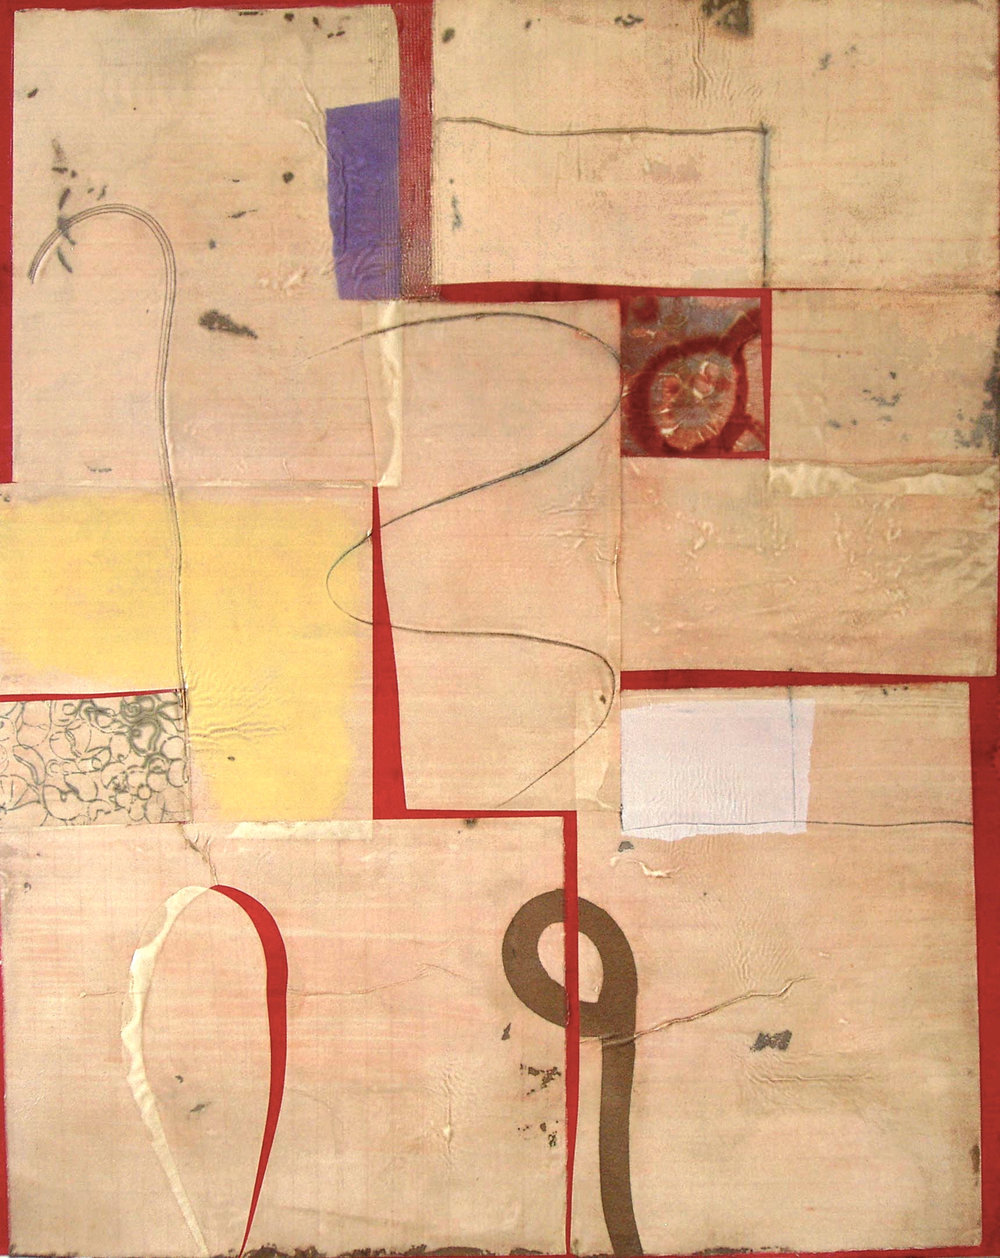 Epigram18 oil, gel, paper on canvas 60x48 inches 152x122 cm 2014